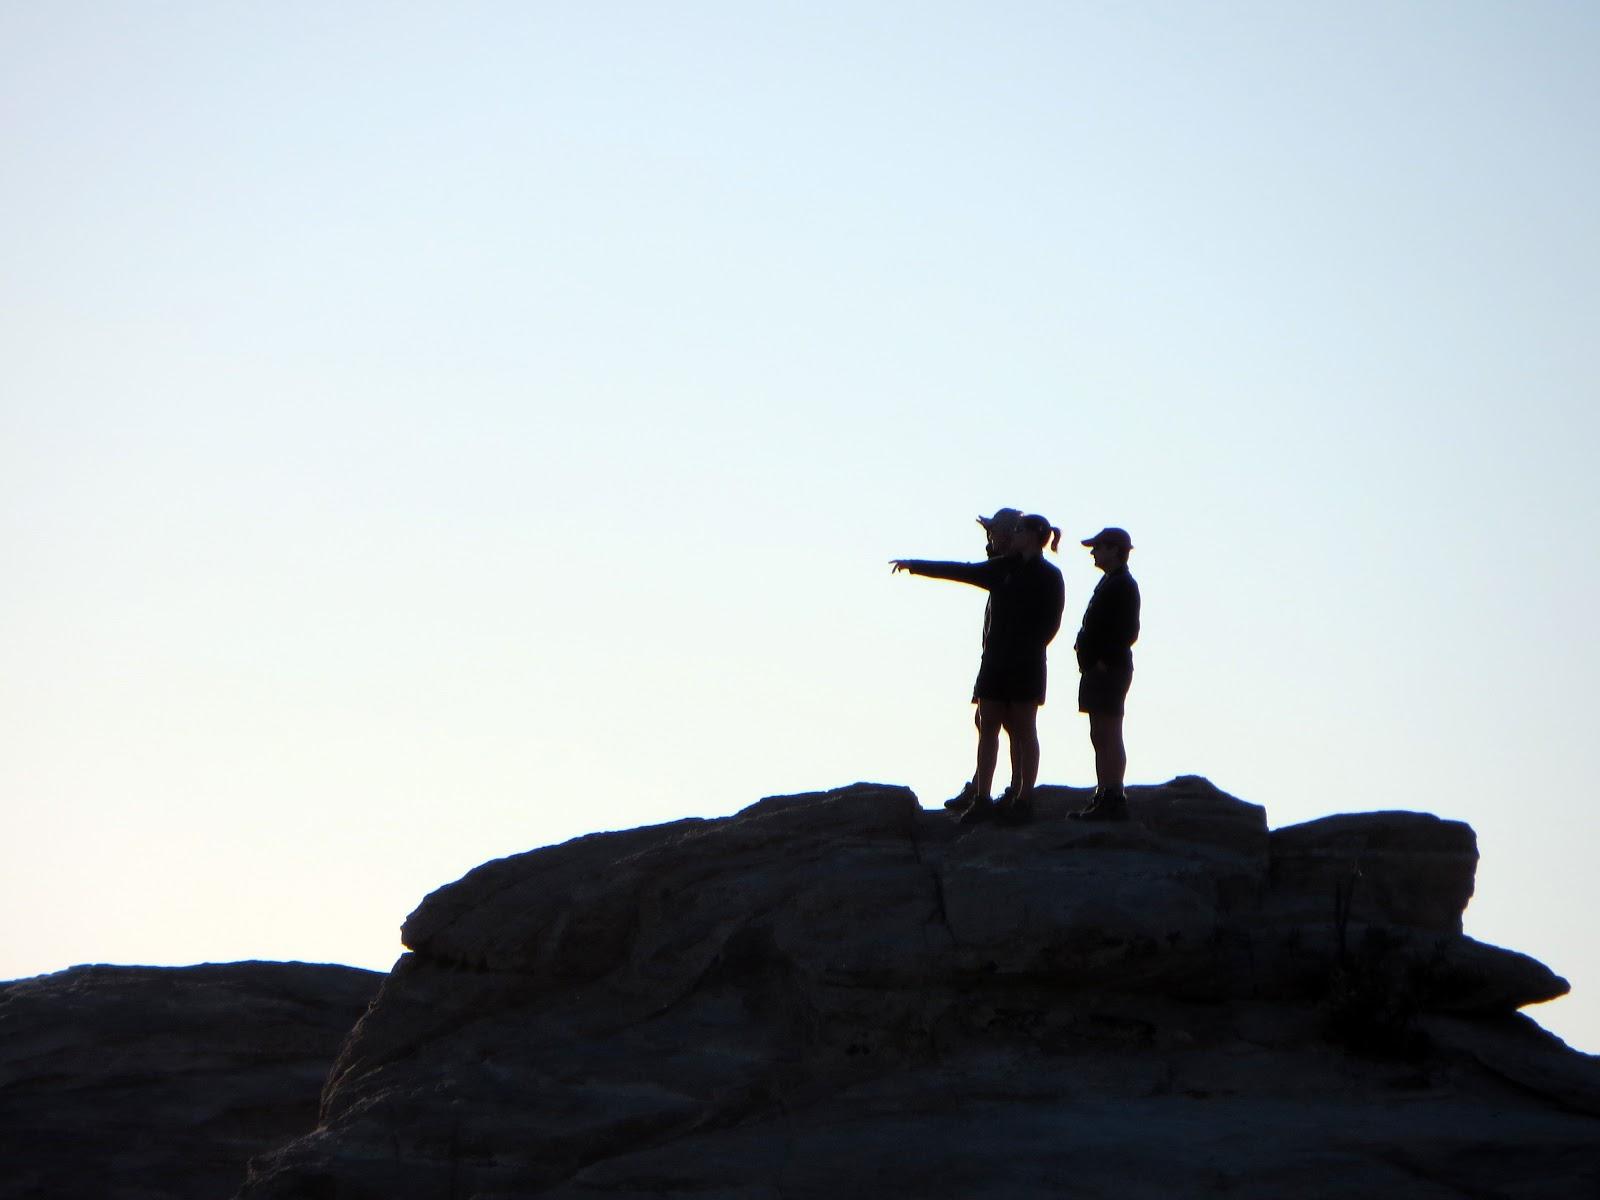 hiking silhouette desktop wallpaper - photo #18